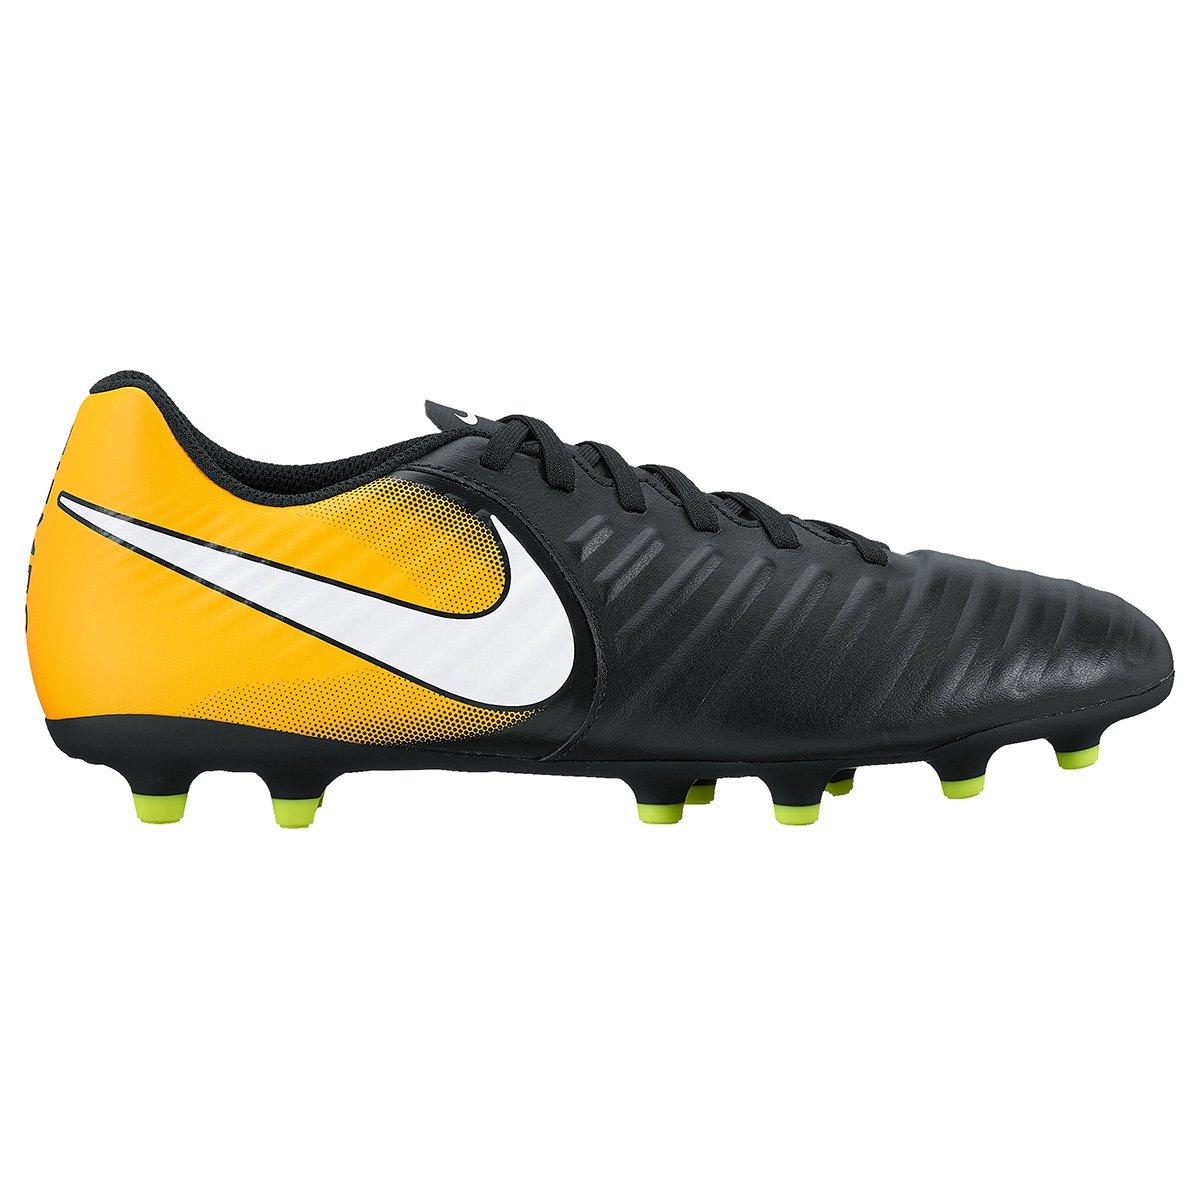 9622f61094 Chuteira Campo Nike Tiempo Rio 4 FG - Preto e Laranja - Compre Agora ...